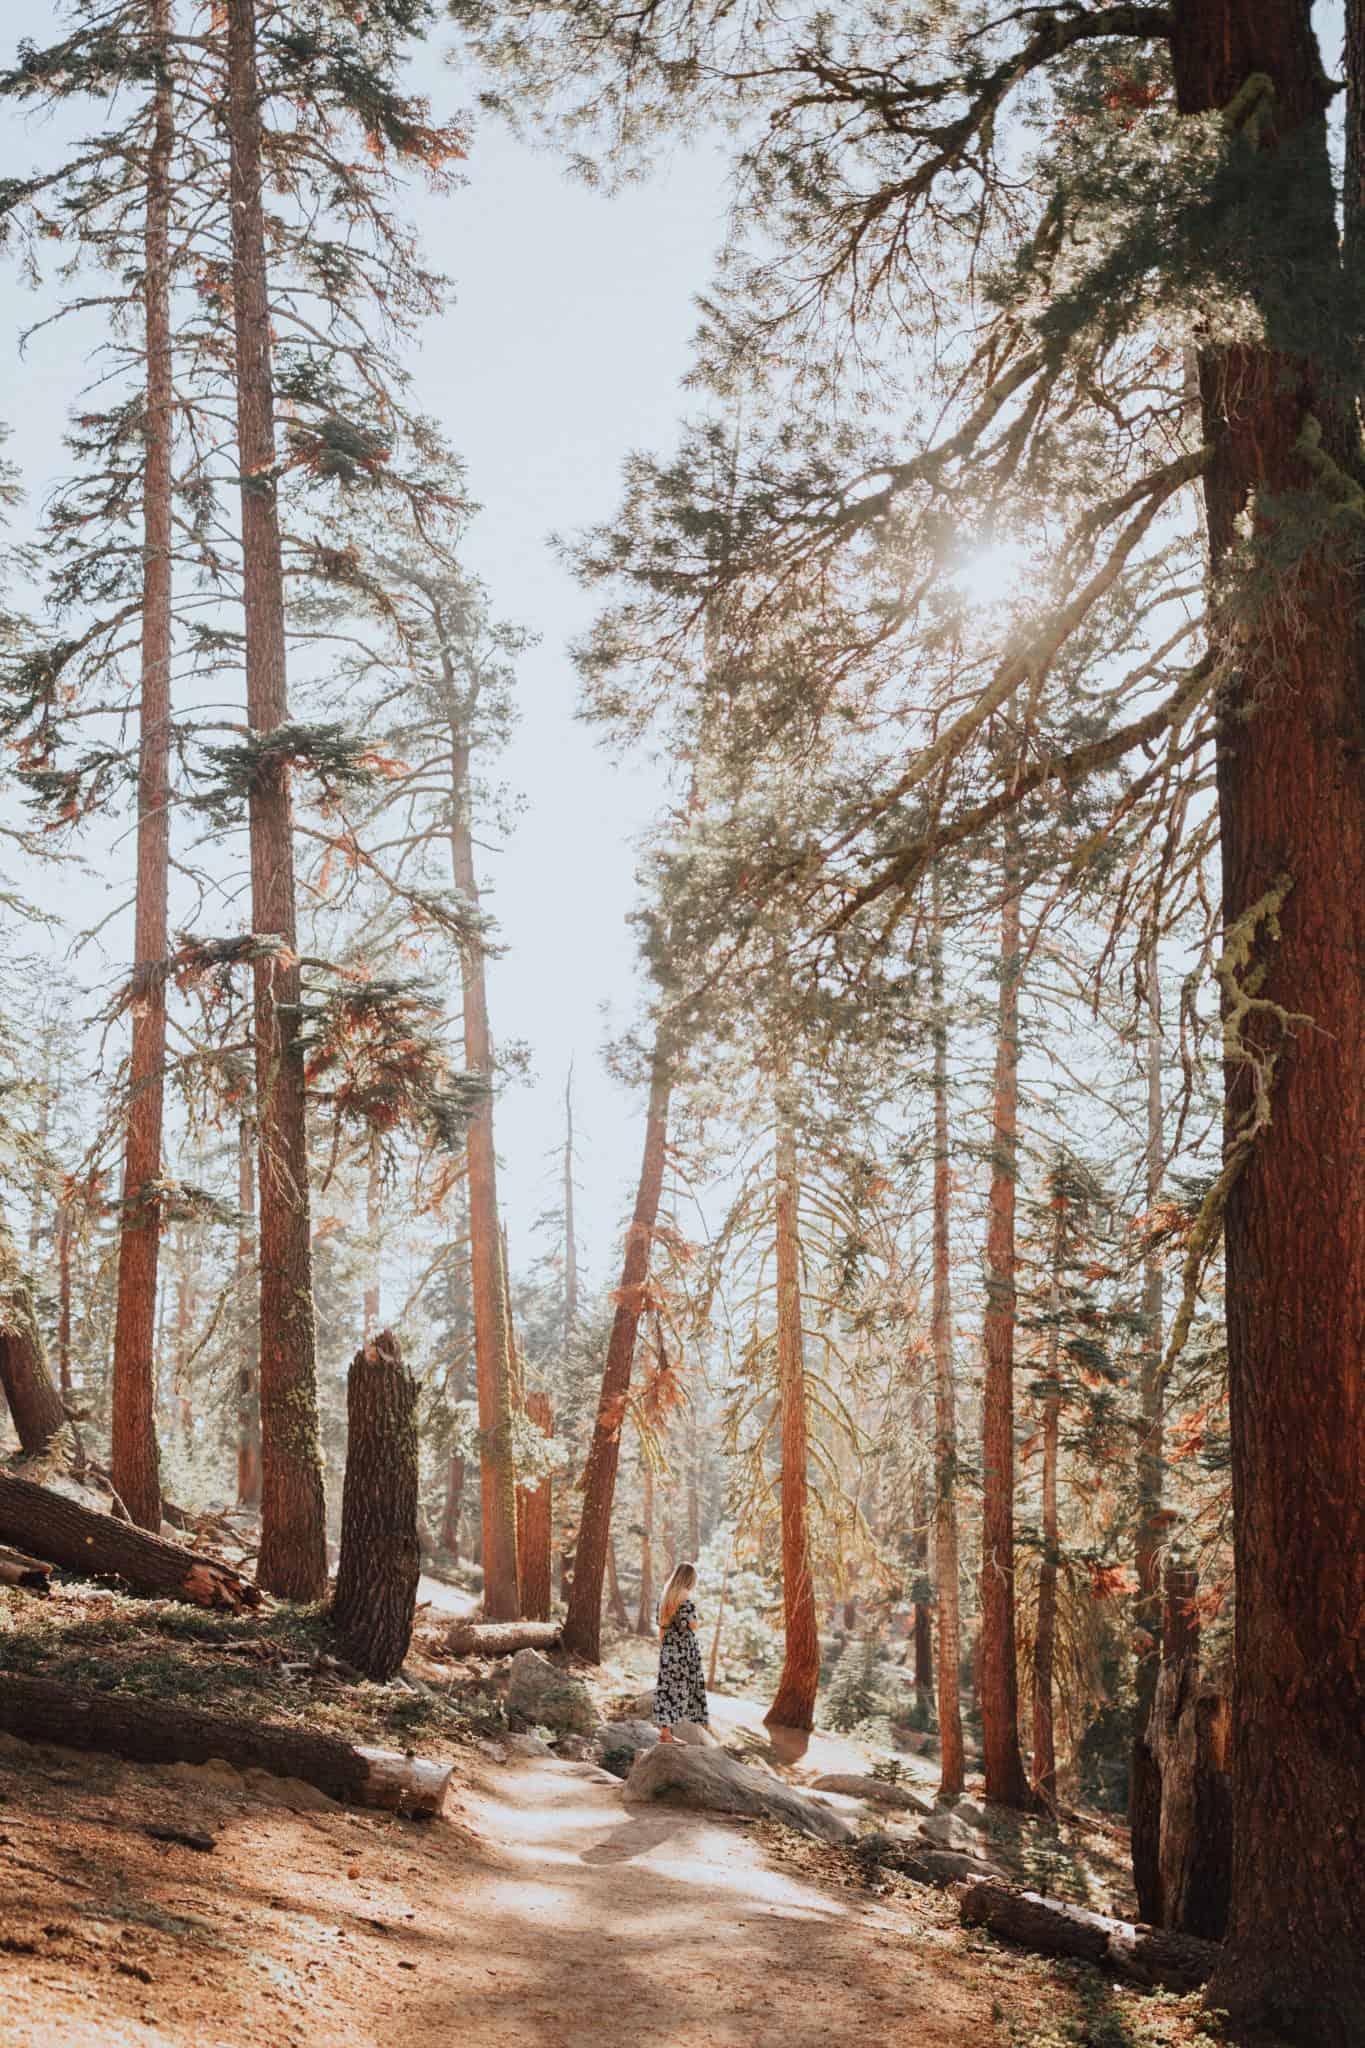 Taft Point, Yosemite National Park TheMandagies.com @themandagies